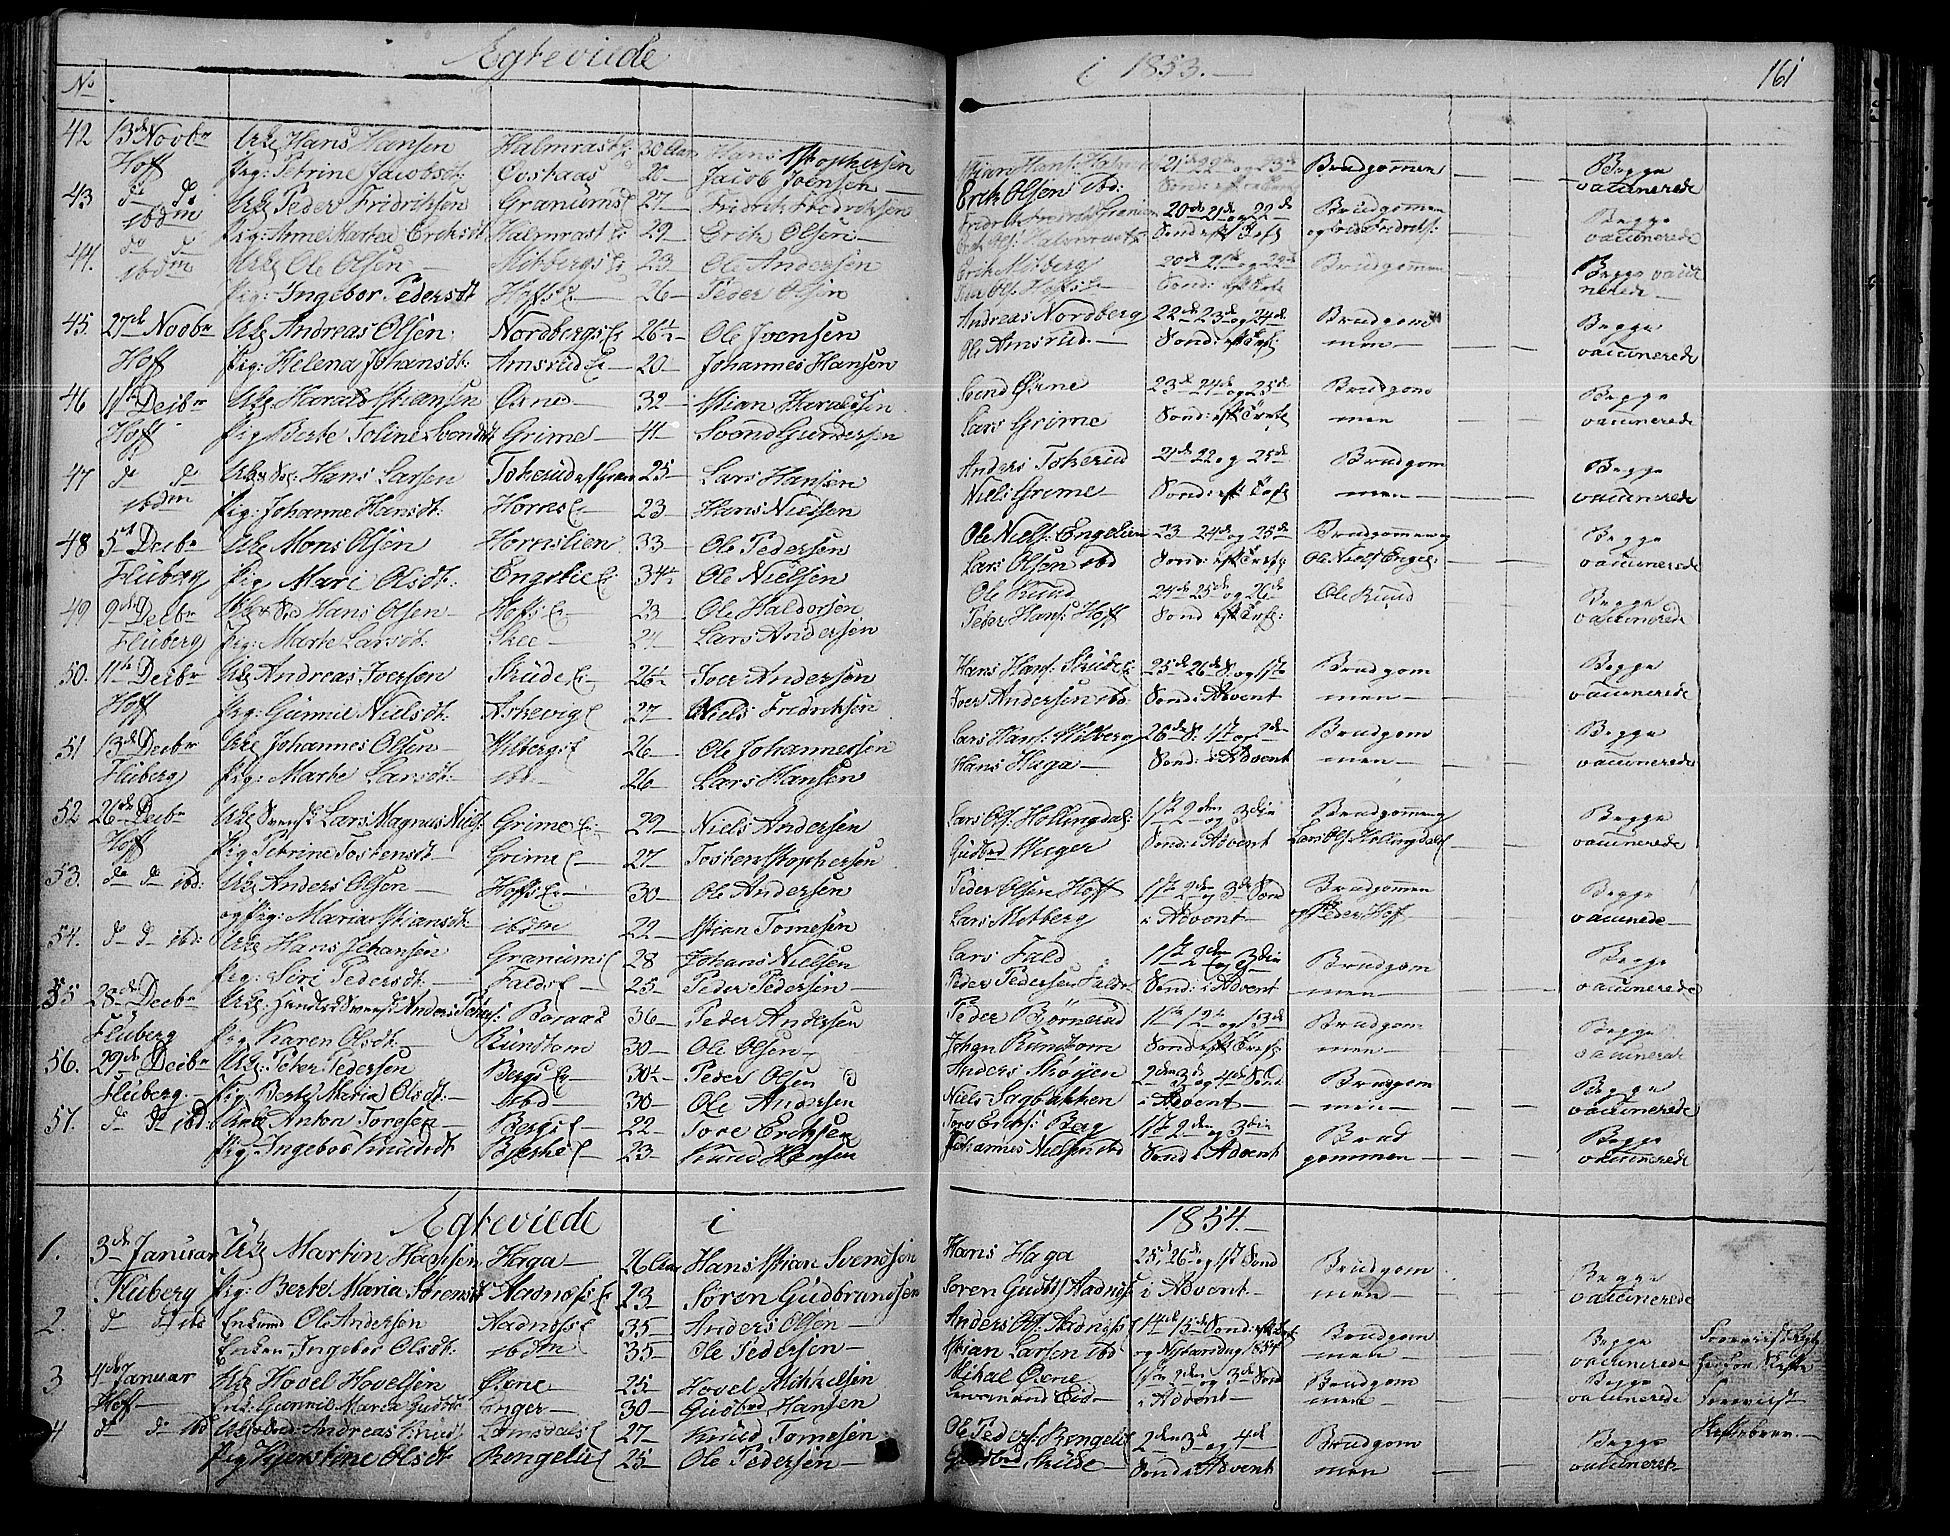 SAH, Søndre Land prestekontor, L/L0001: Klokkerbok nr. 1, 1849-1883, s. 161